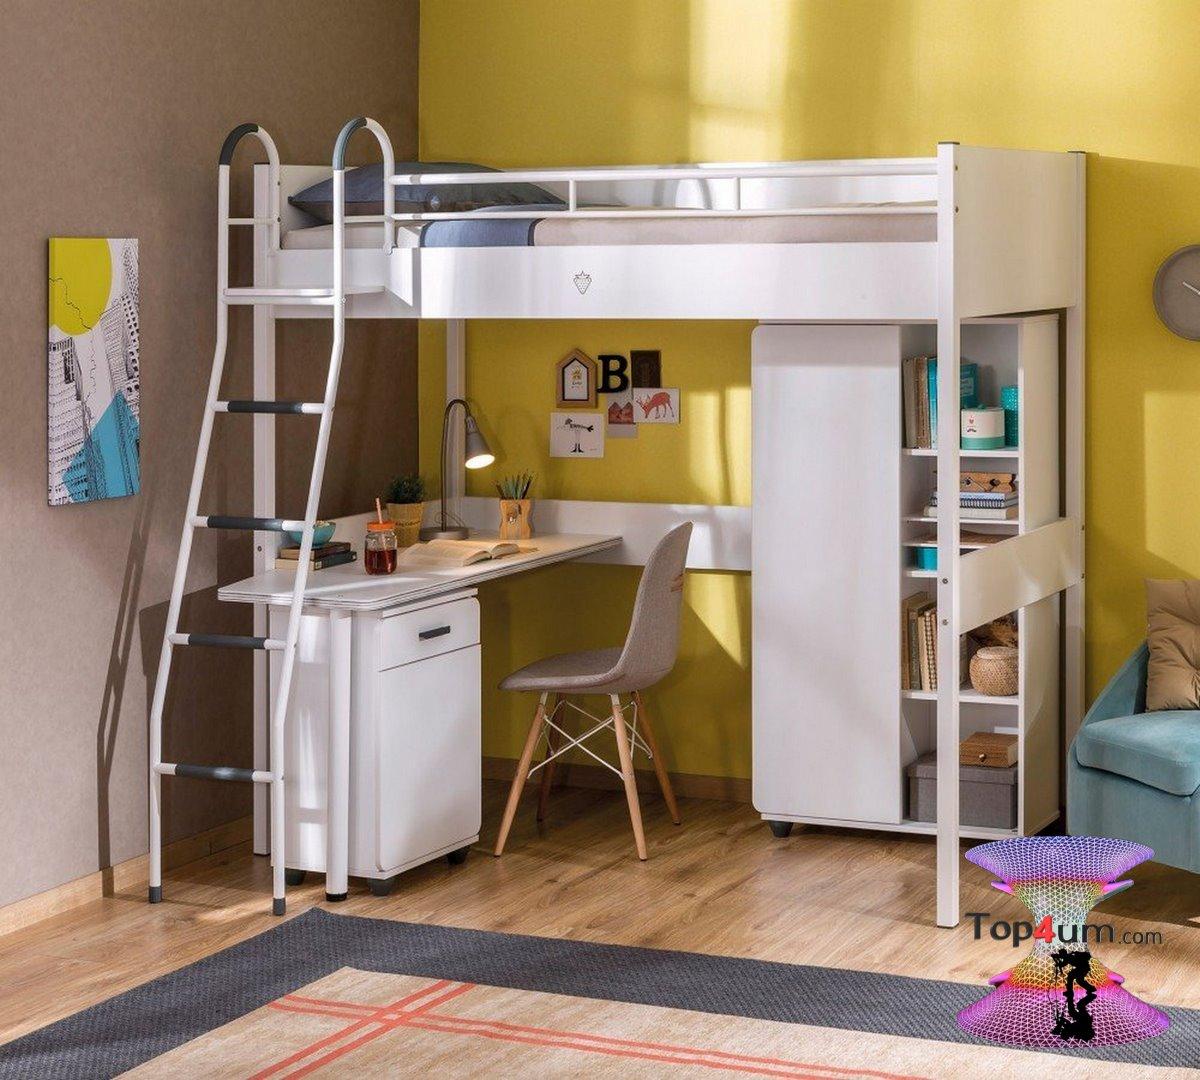 f:id:kitchendesignsegypt:20191020021922j:plain